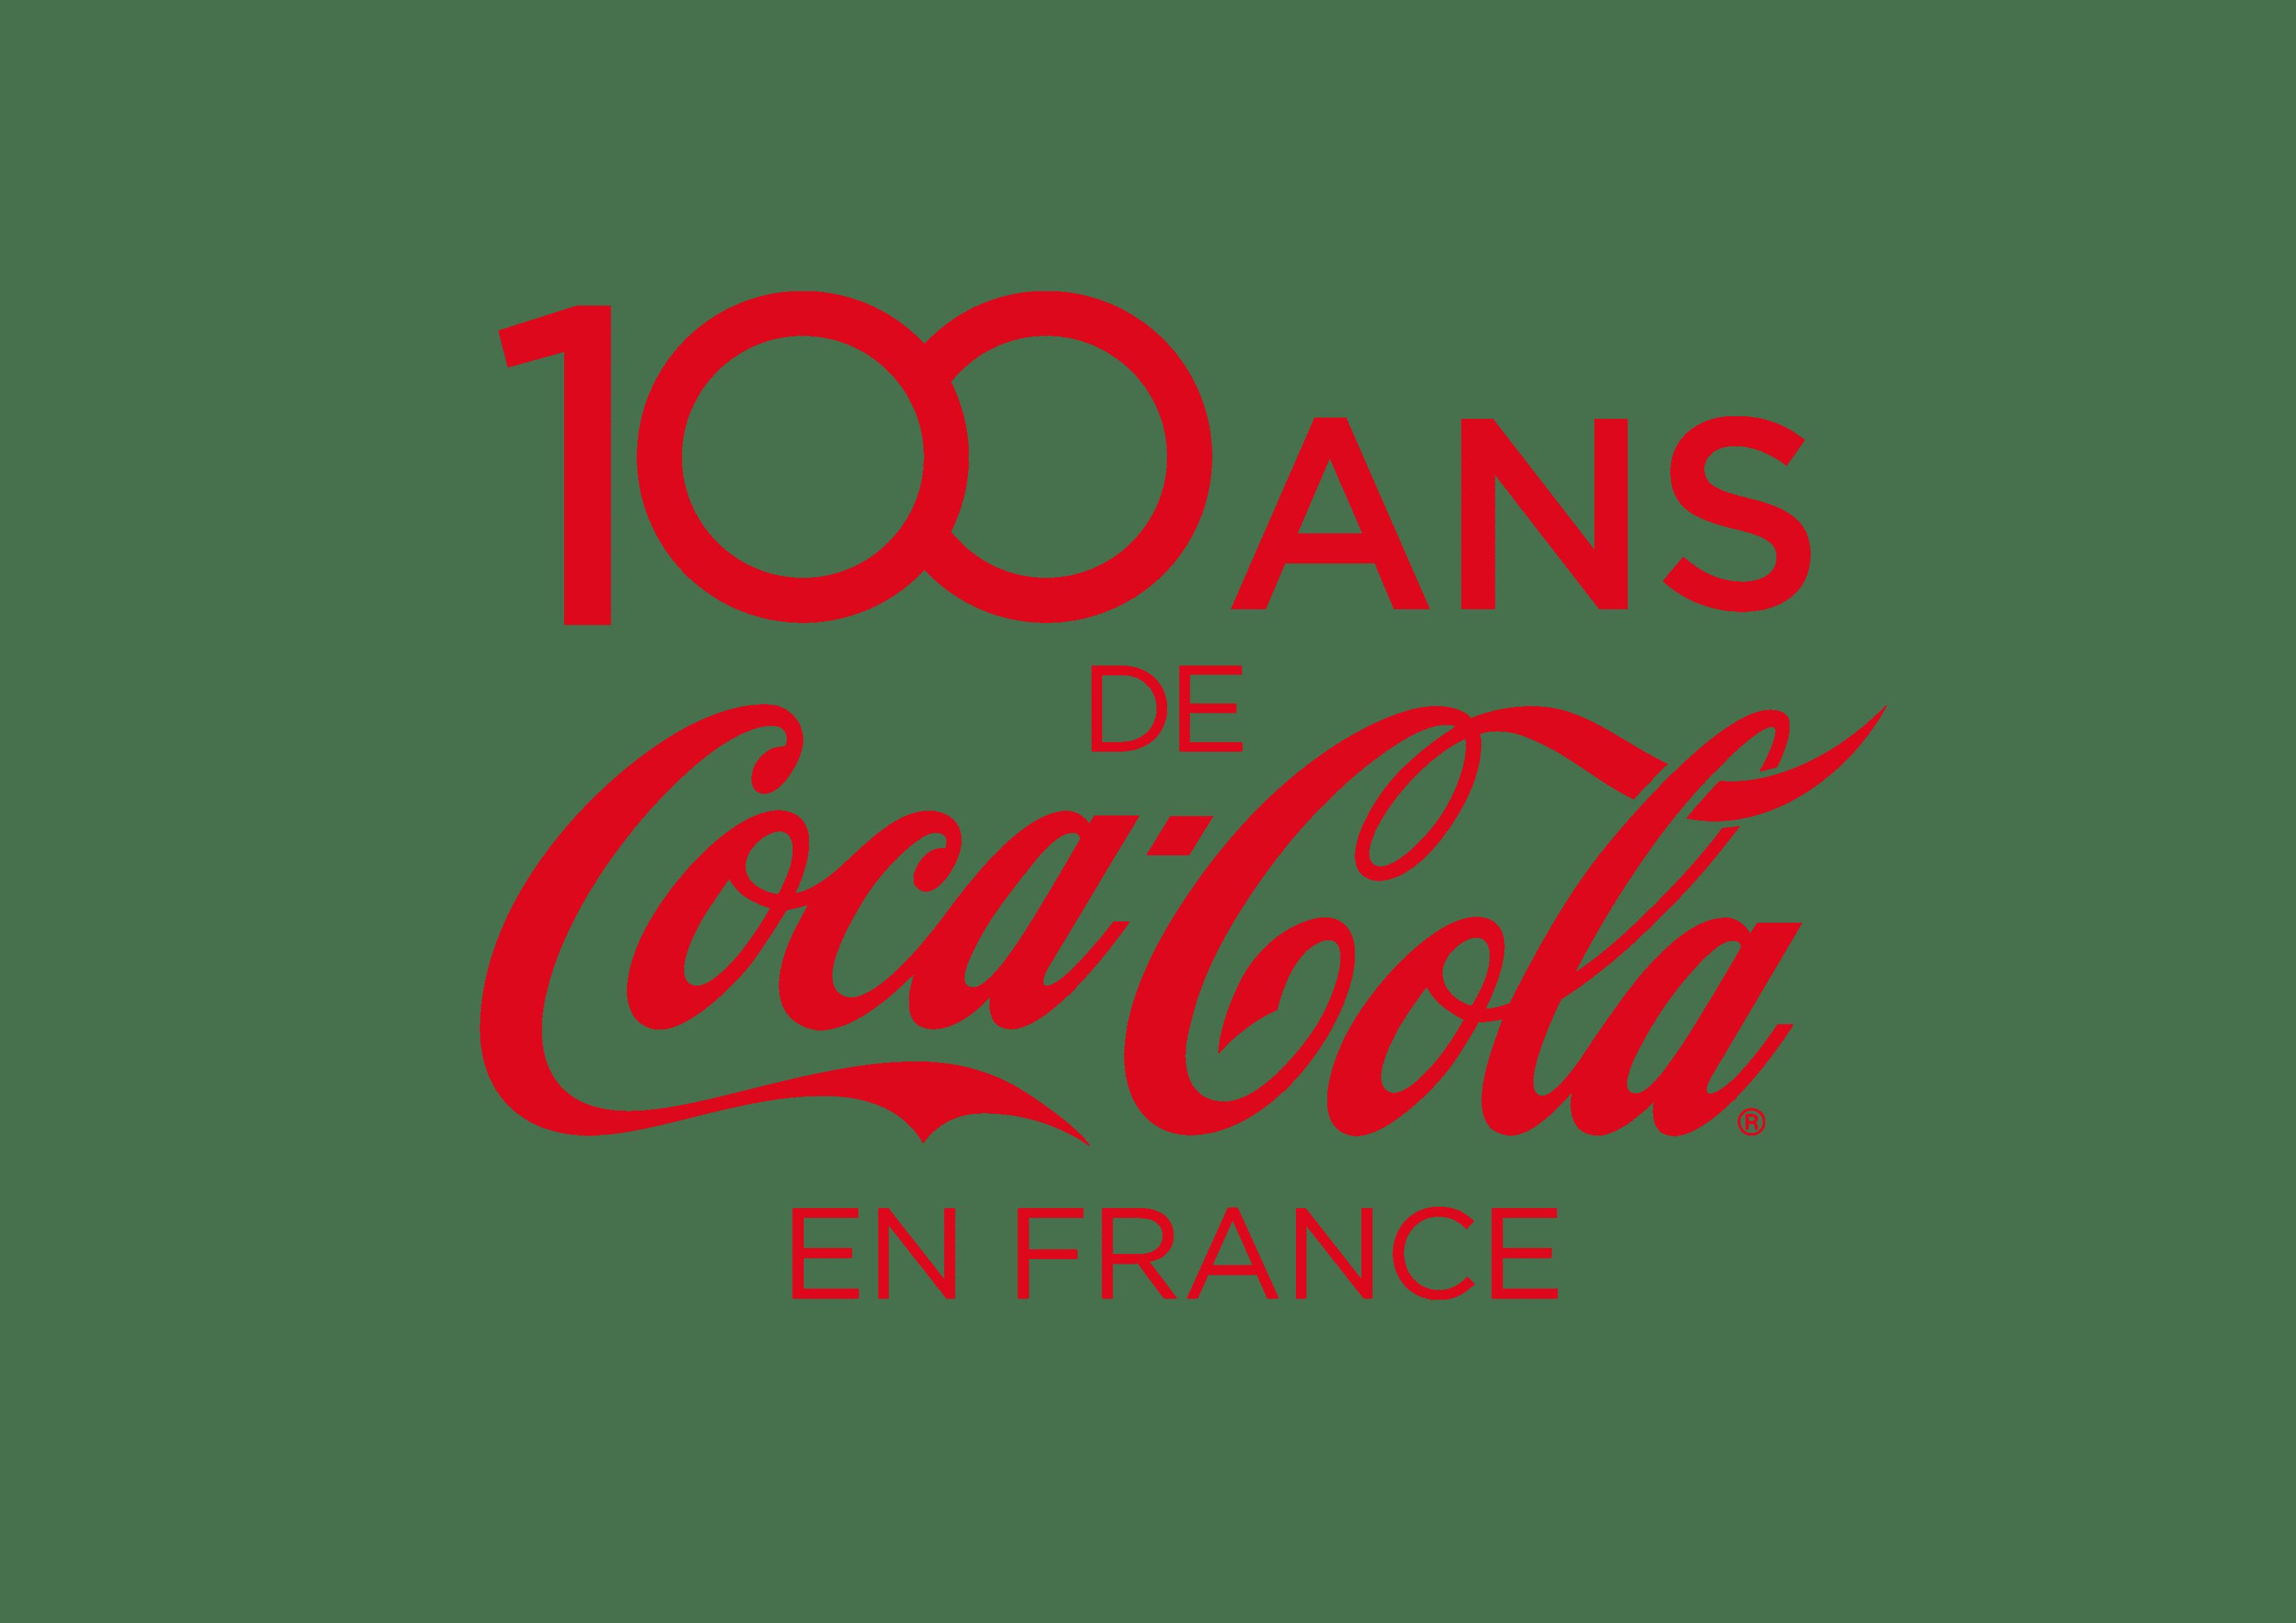 100 ans de Coca Cola en France Escape Room